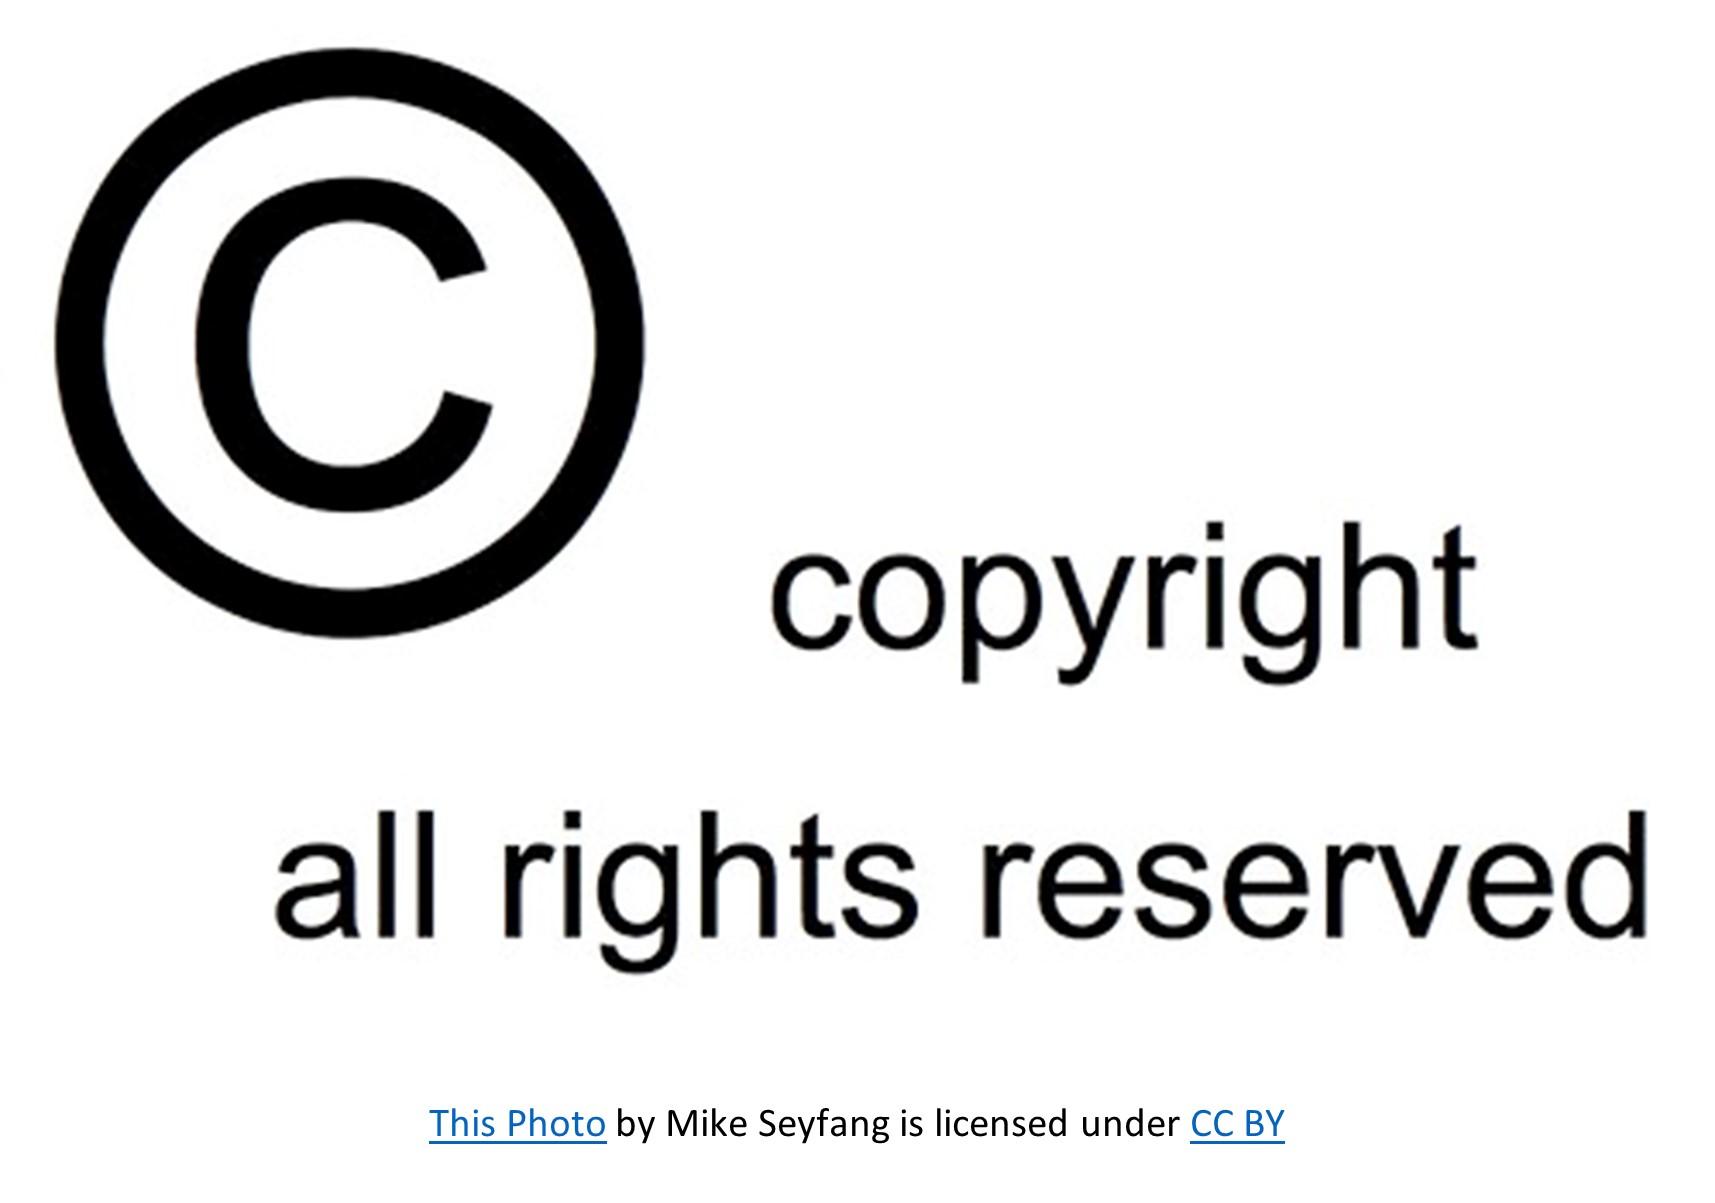 Copyright Logo image